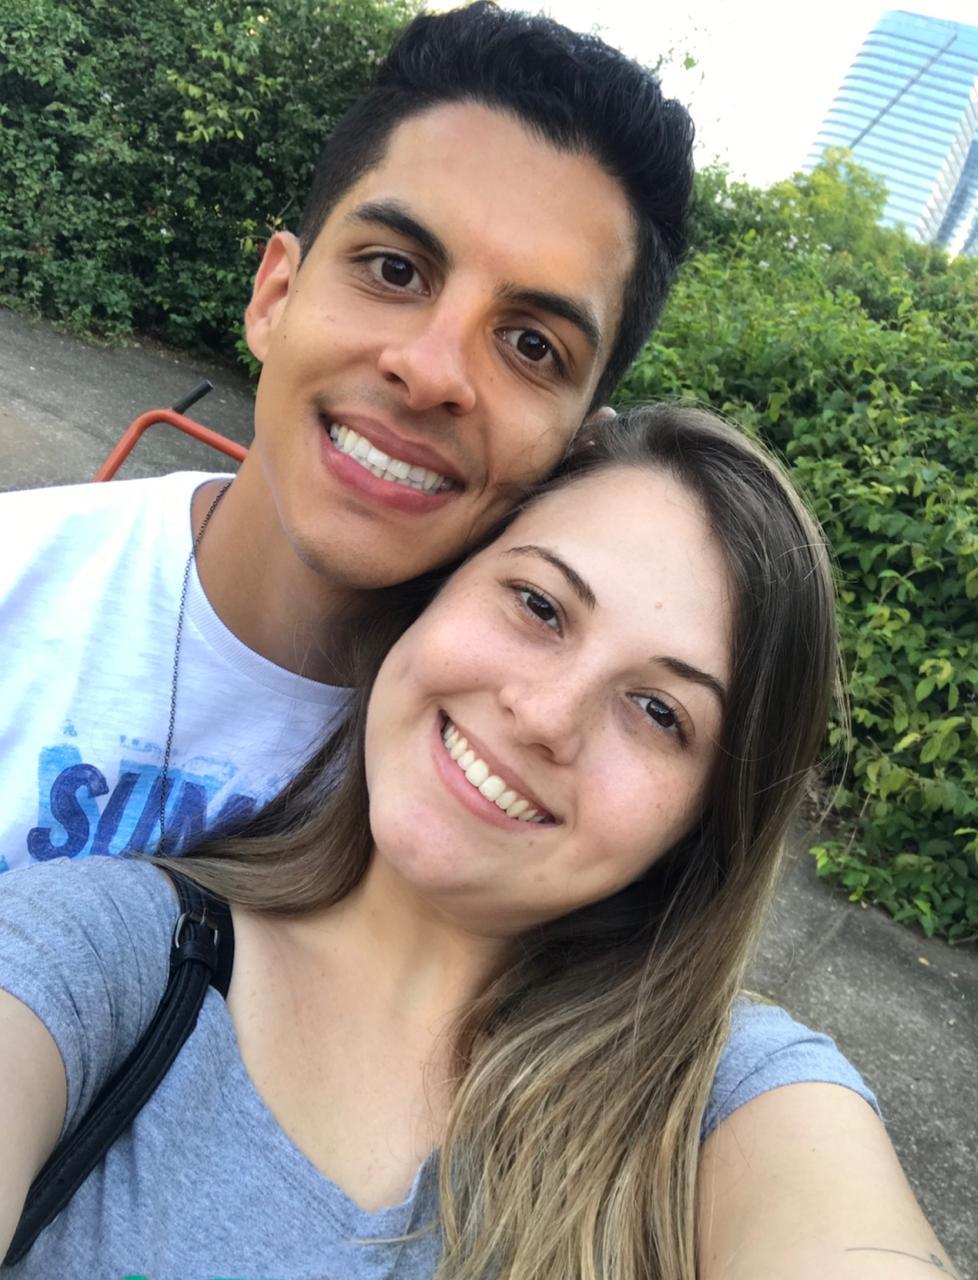 selfie namorados sorrindo